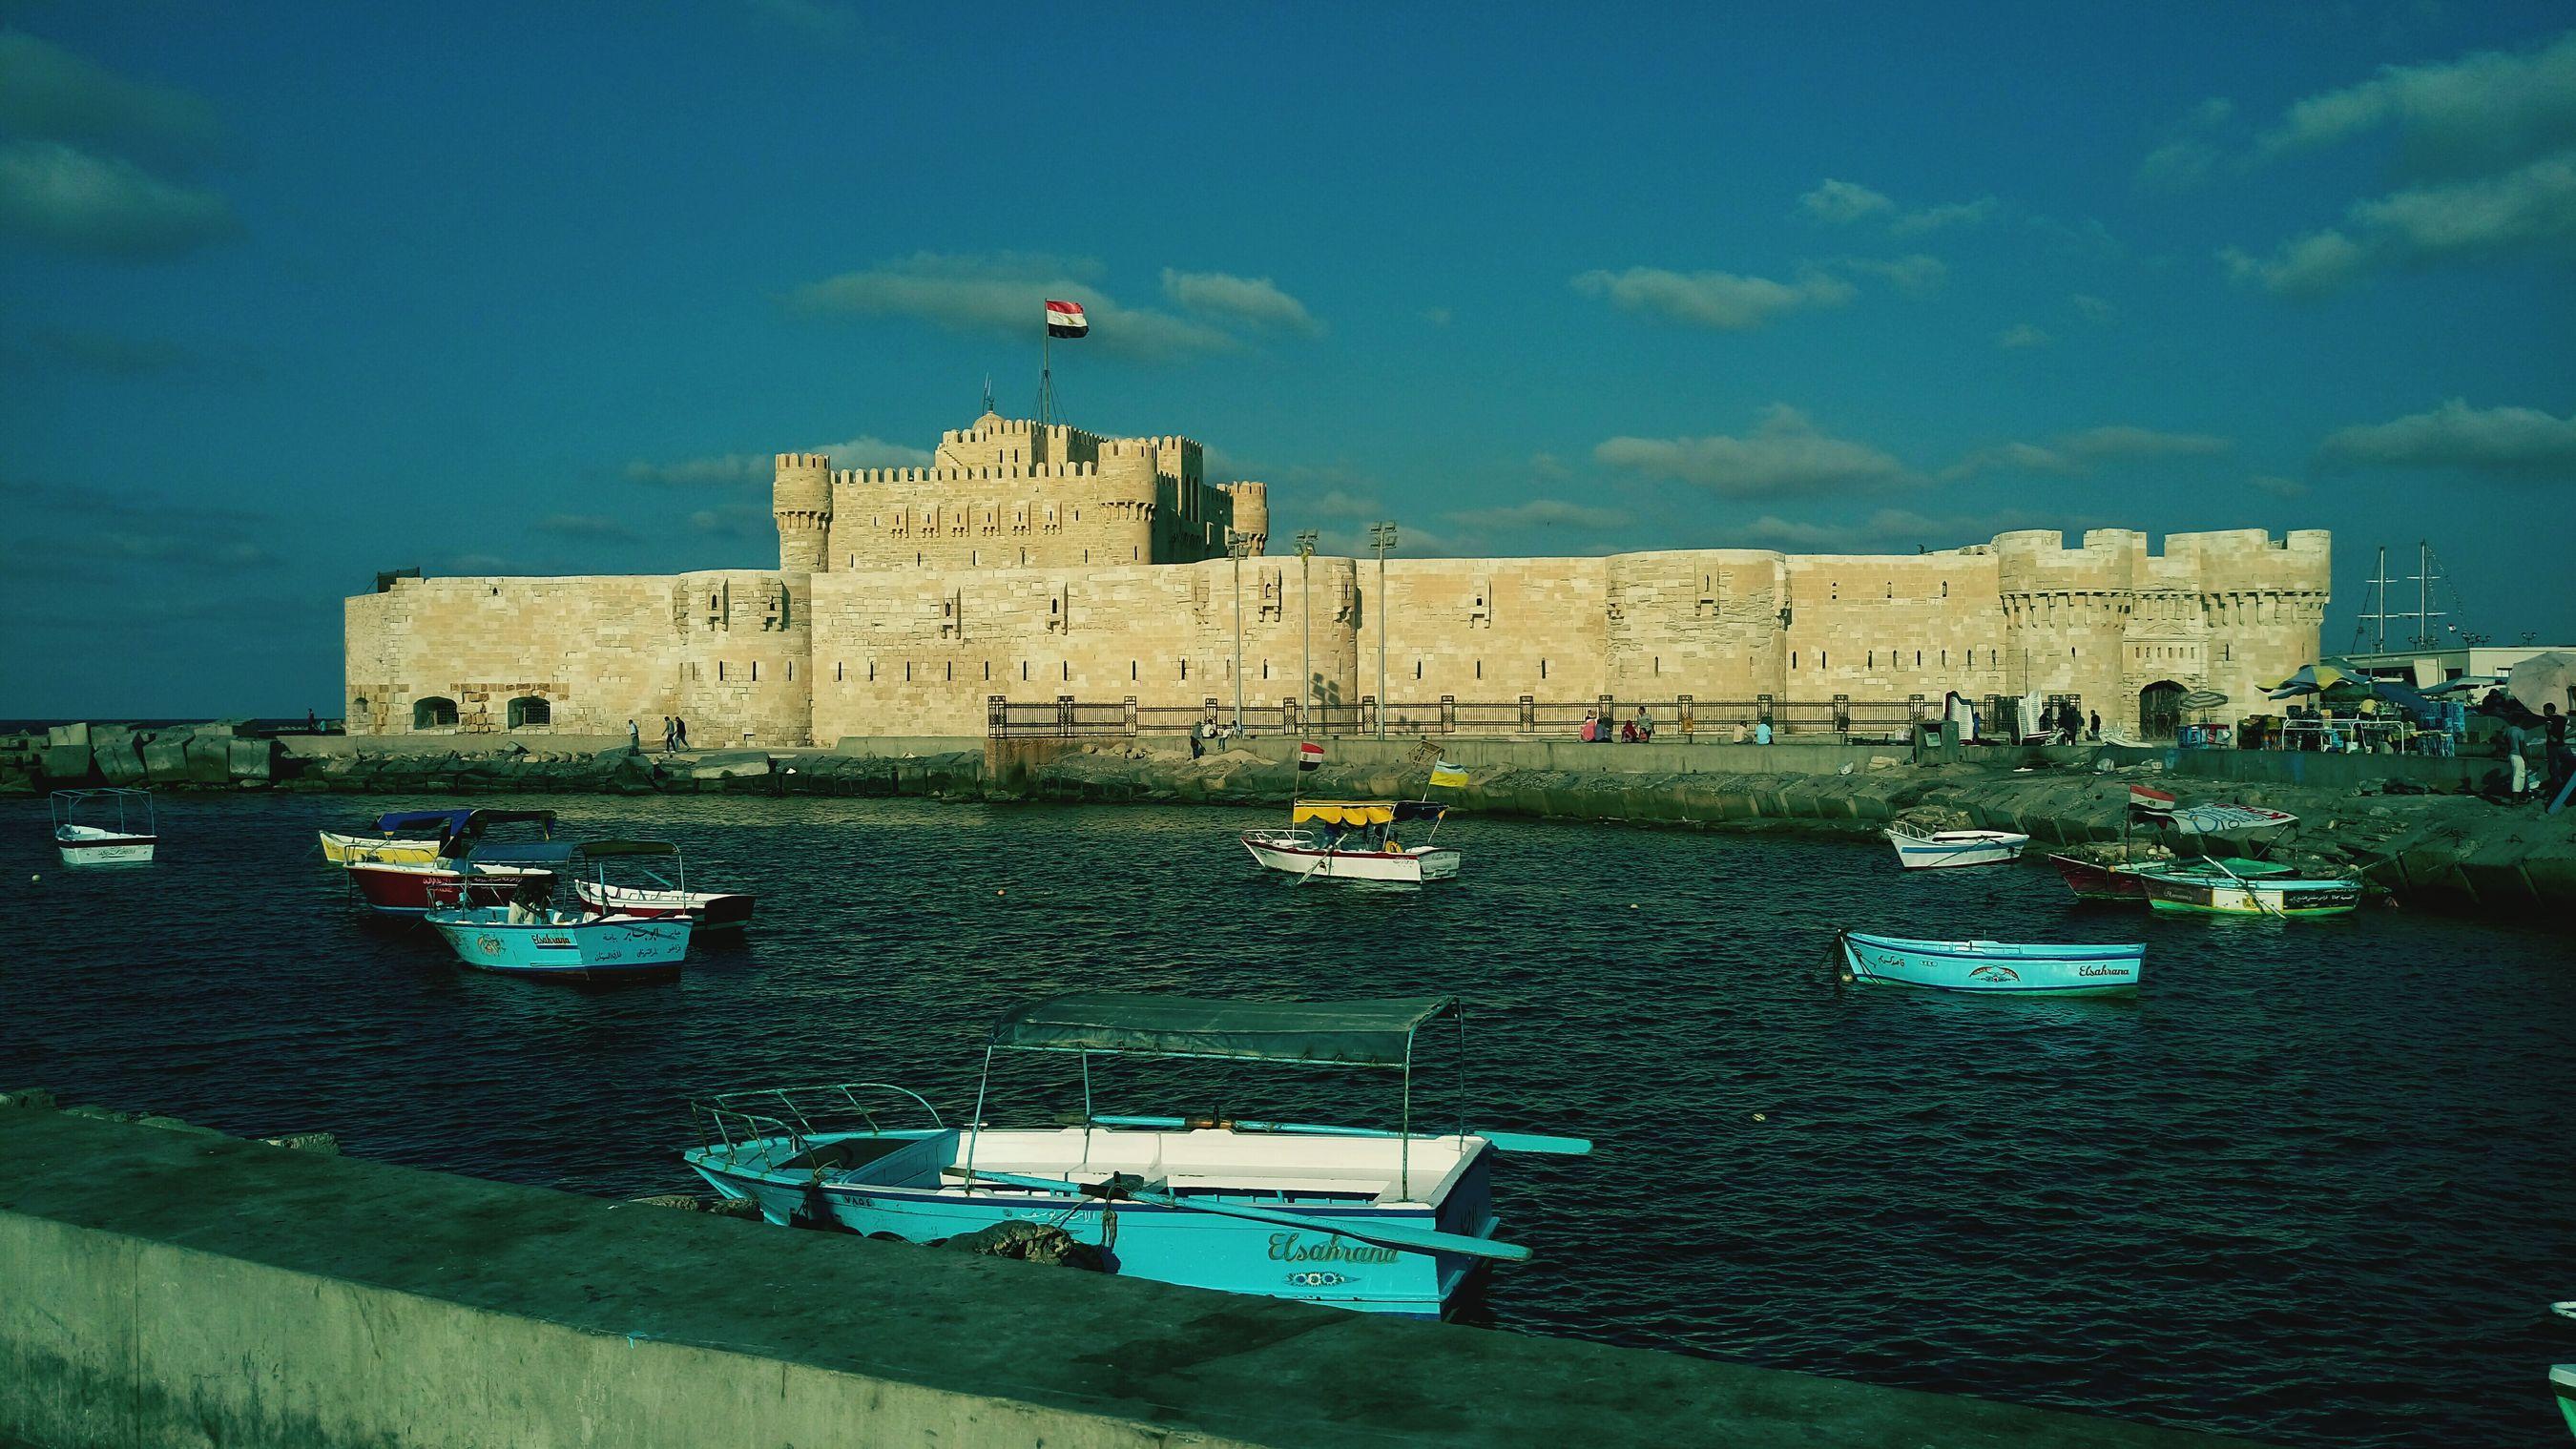 Architecture Alexandria Egypt Citadelofqaitbay Water History First Eyeem Photo Relaxing Mediterranean Sea Queen Of The Sea